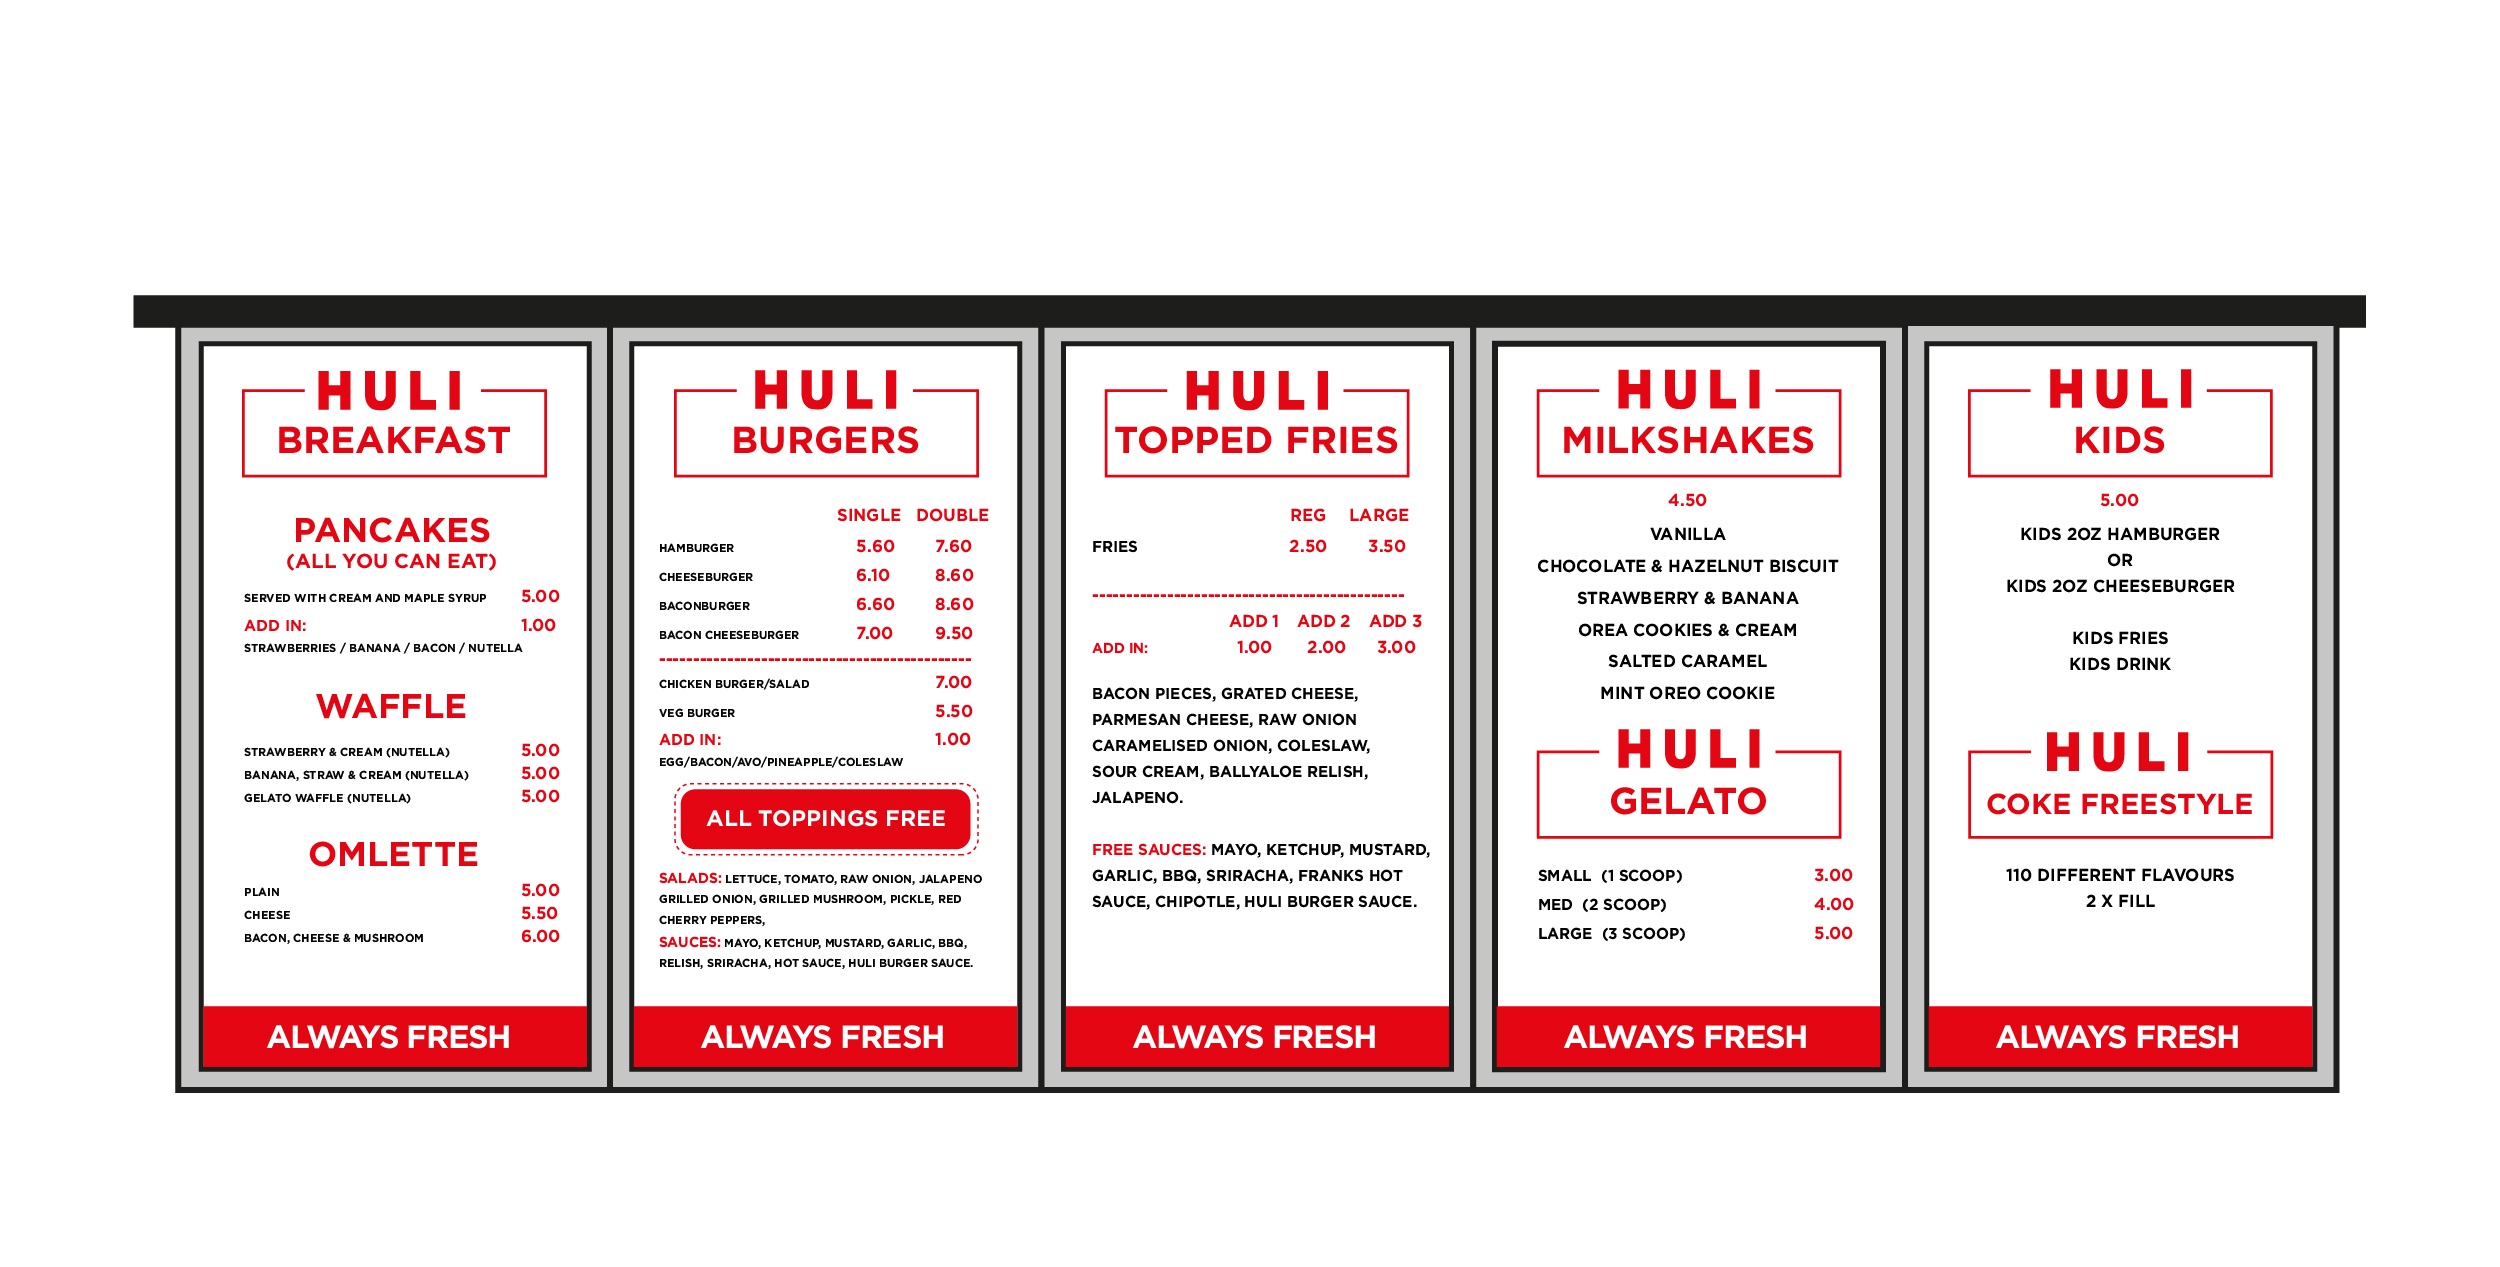 LMPP Huli Burgers Store menu.jpg